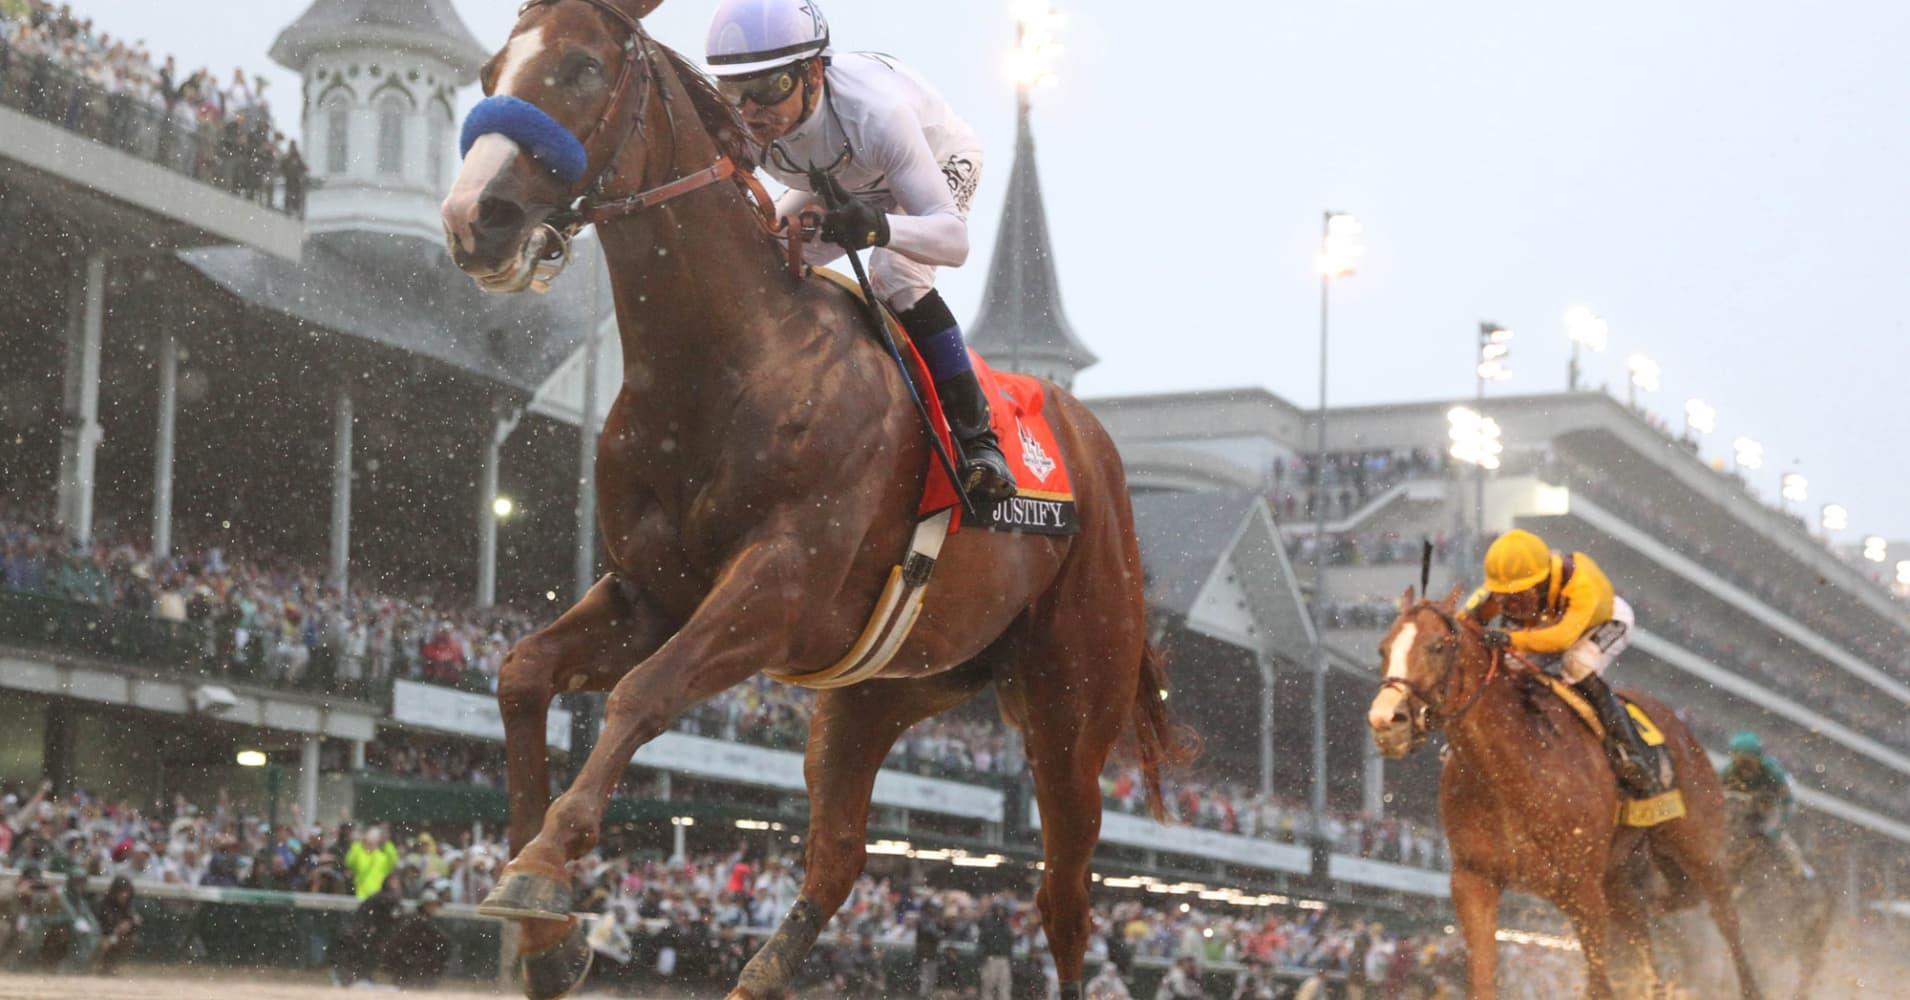 Justify wins Triple Crown at Belmont Stakes